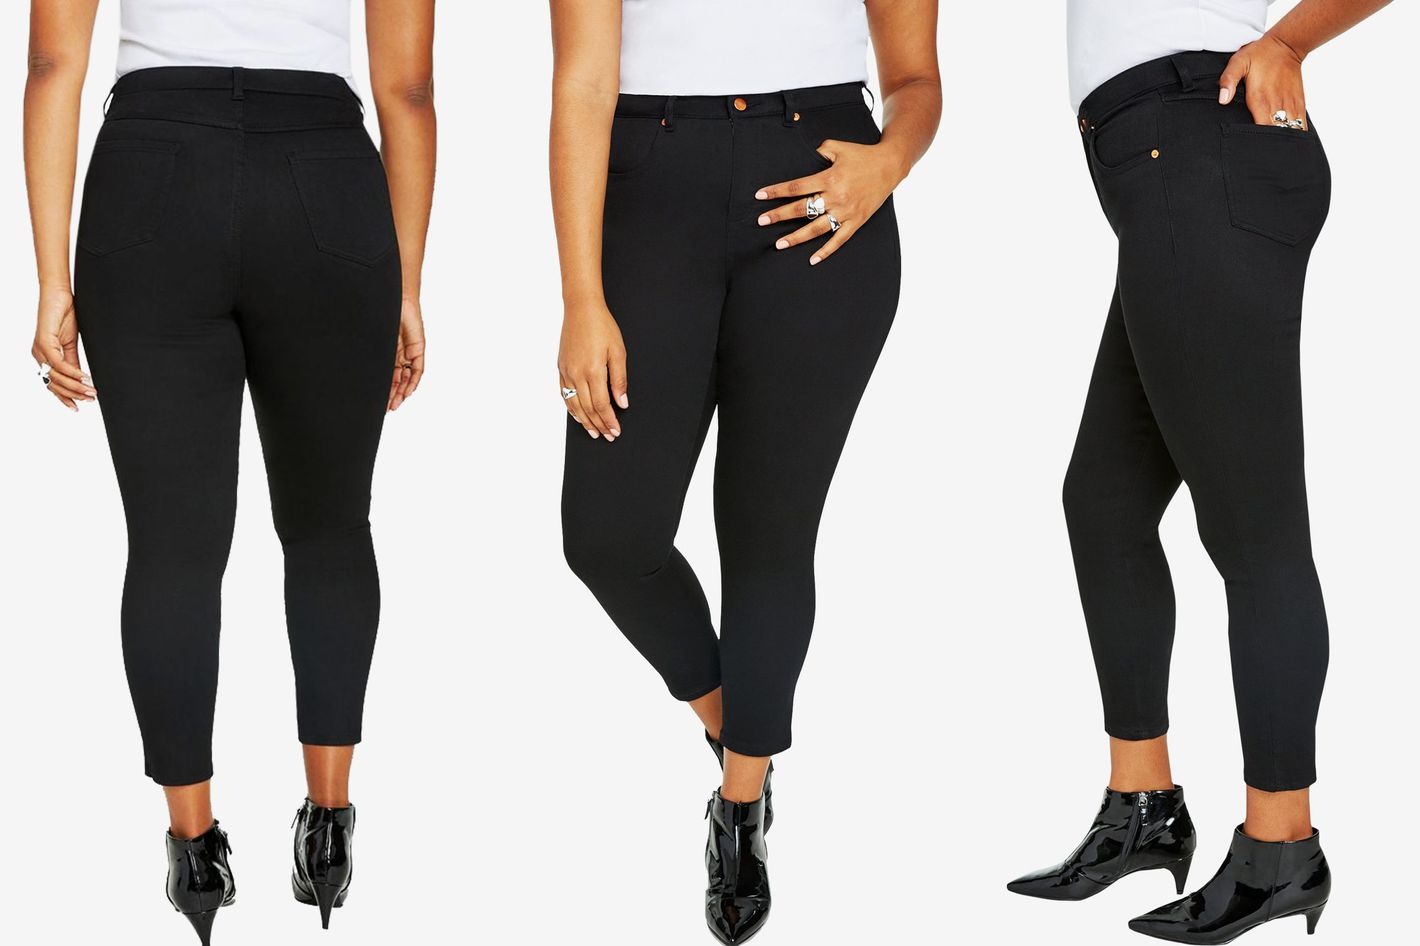 b471e79113cc1 Universal Standard Slim Seine Plus-Size Jeans Review 2018